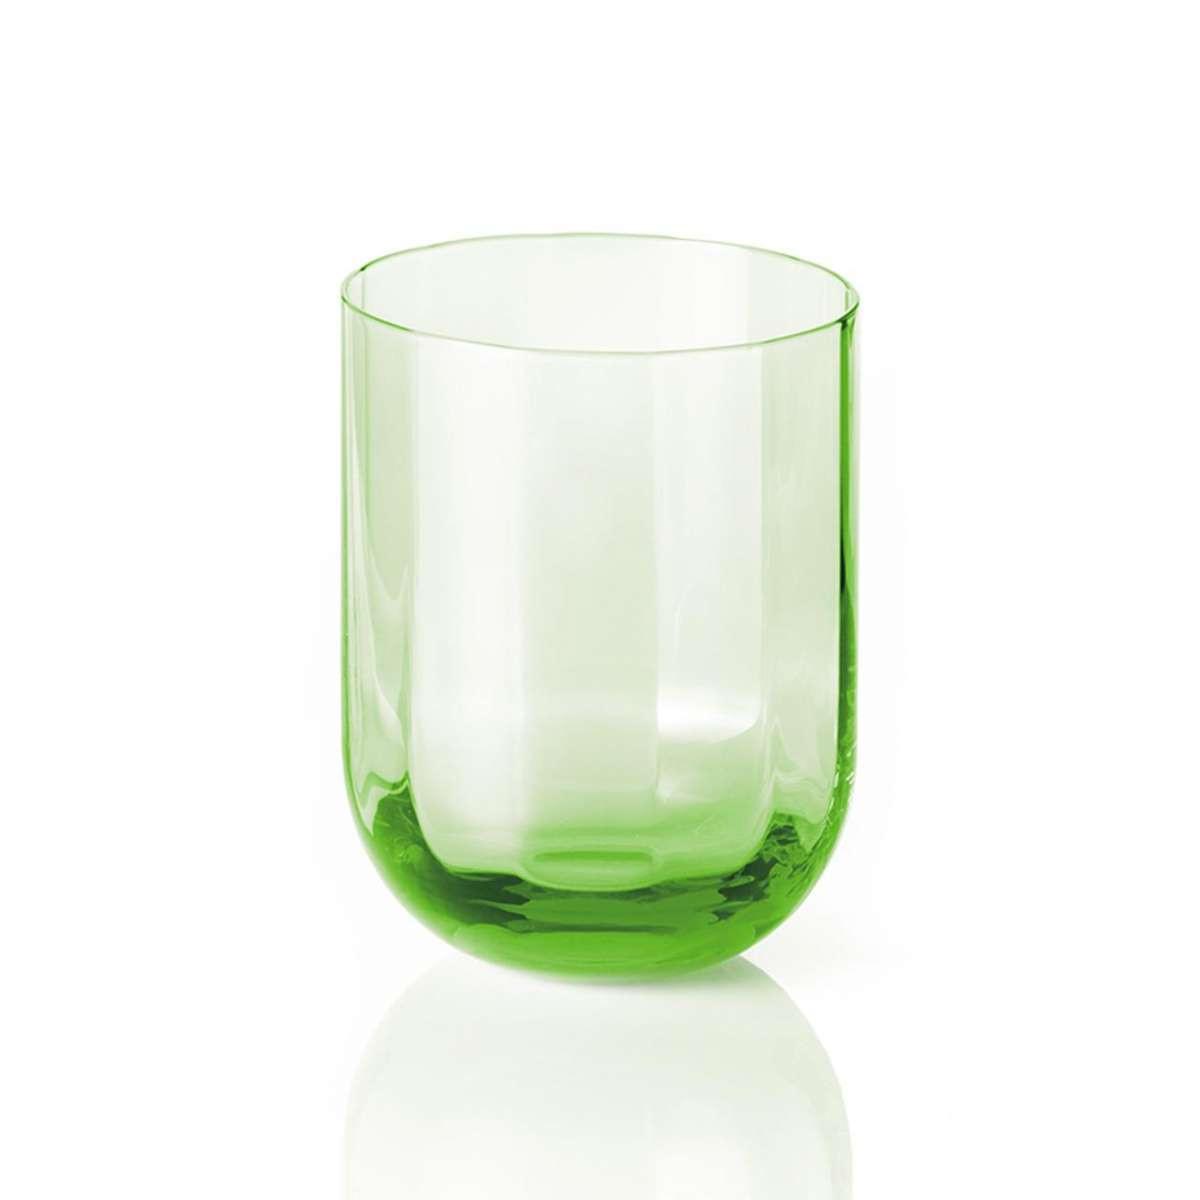 6 x 12 cylinder vase of dibbern rotondo optic glass 0 25 l green franzen da¼sseldorf inside dibbern rotondo optic glass 0 25 l green franzen da¼sseldorf onlineshop